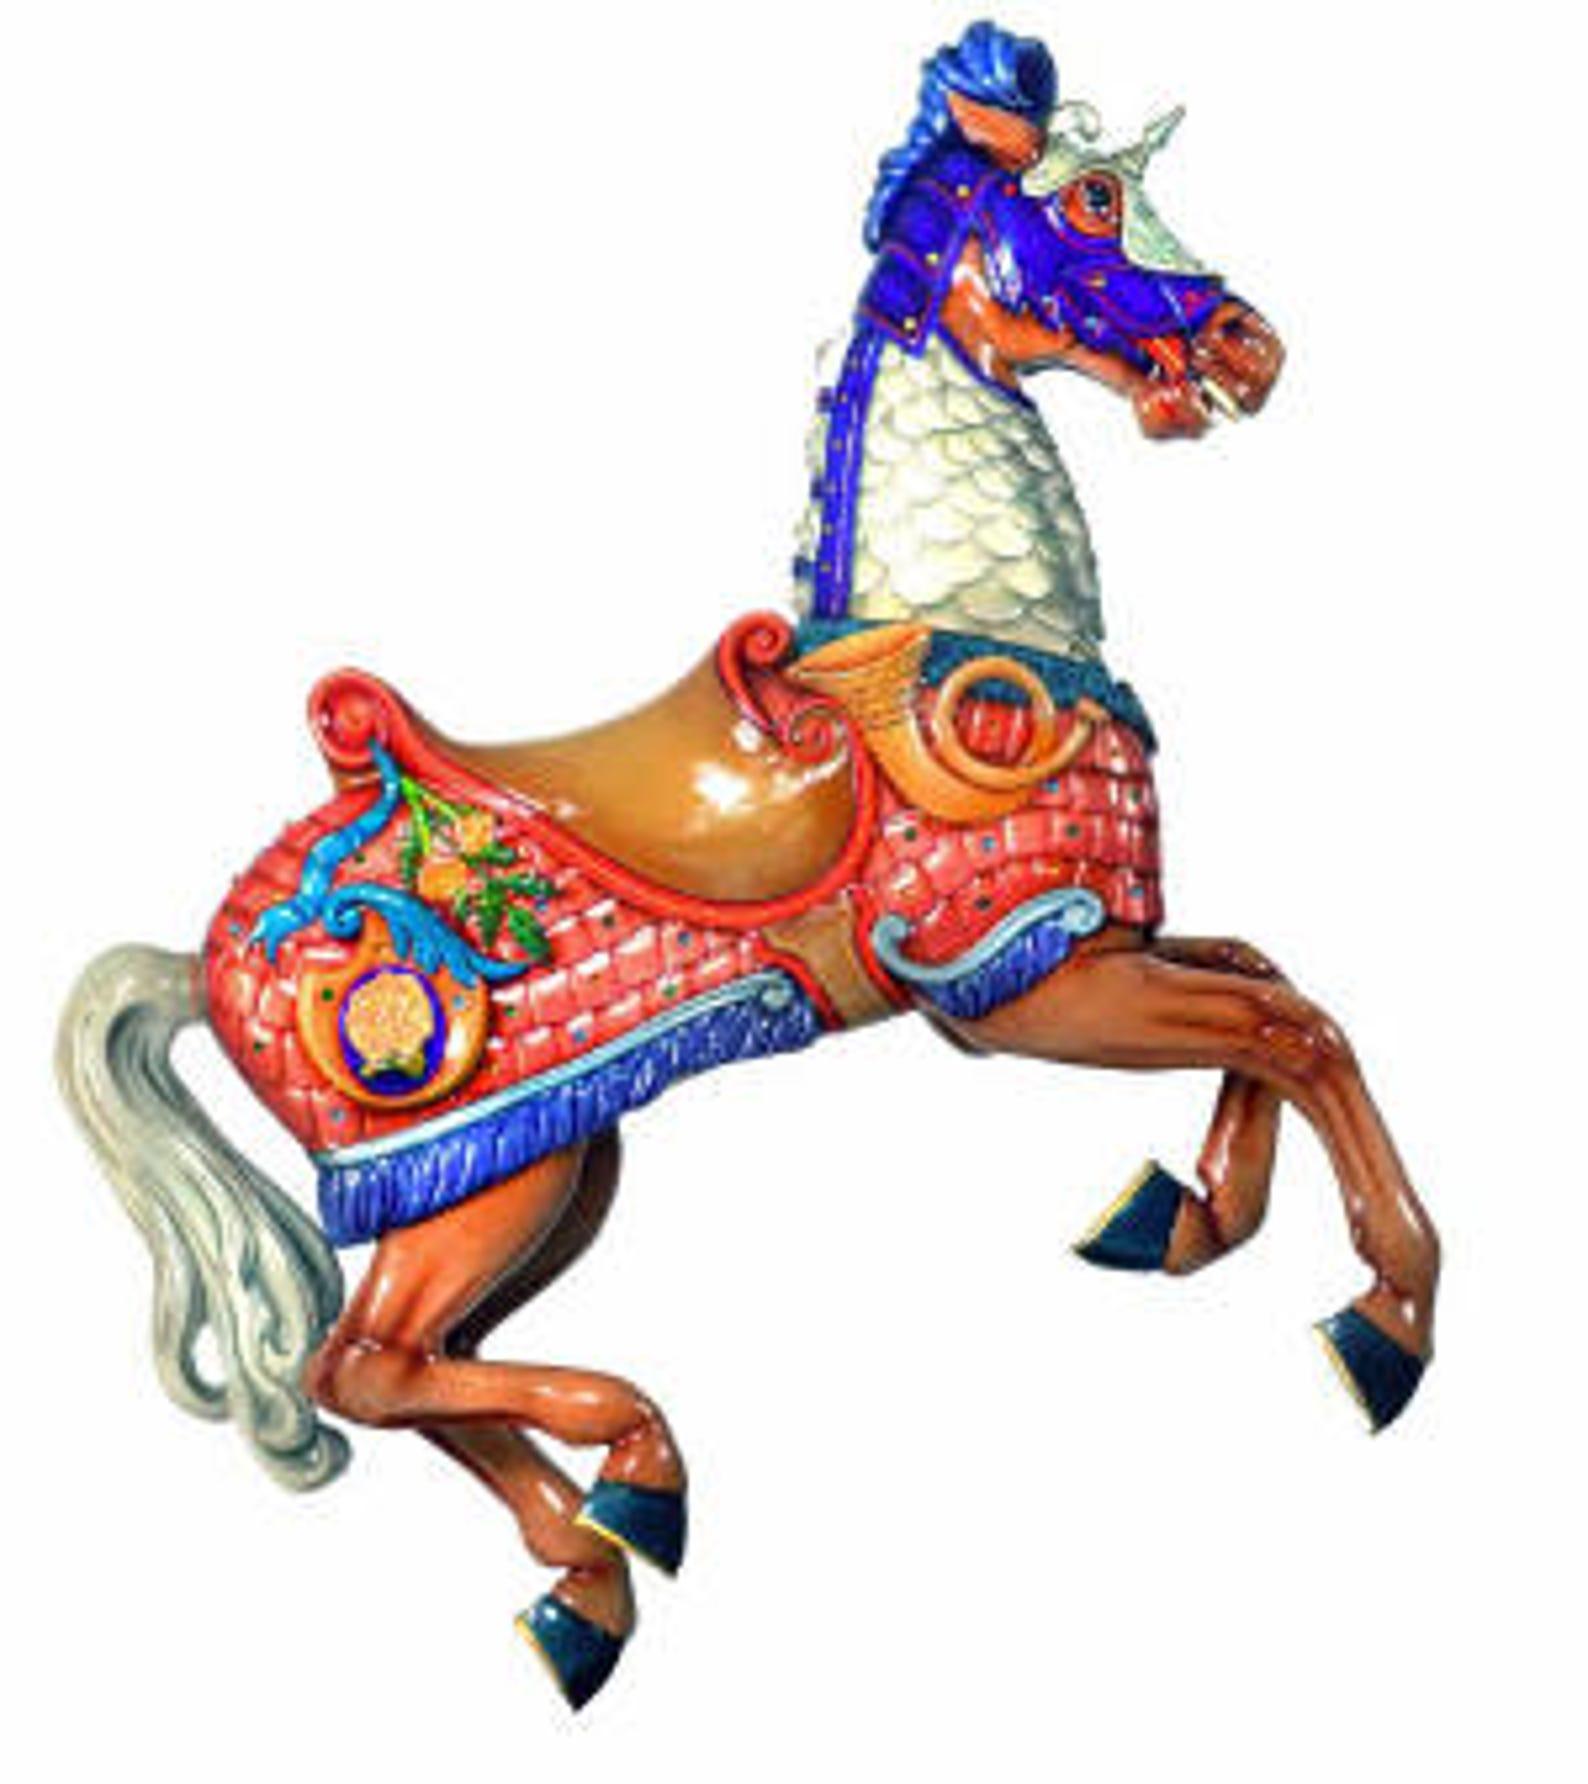 Meet the Salem's Riverfront Carousel horses